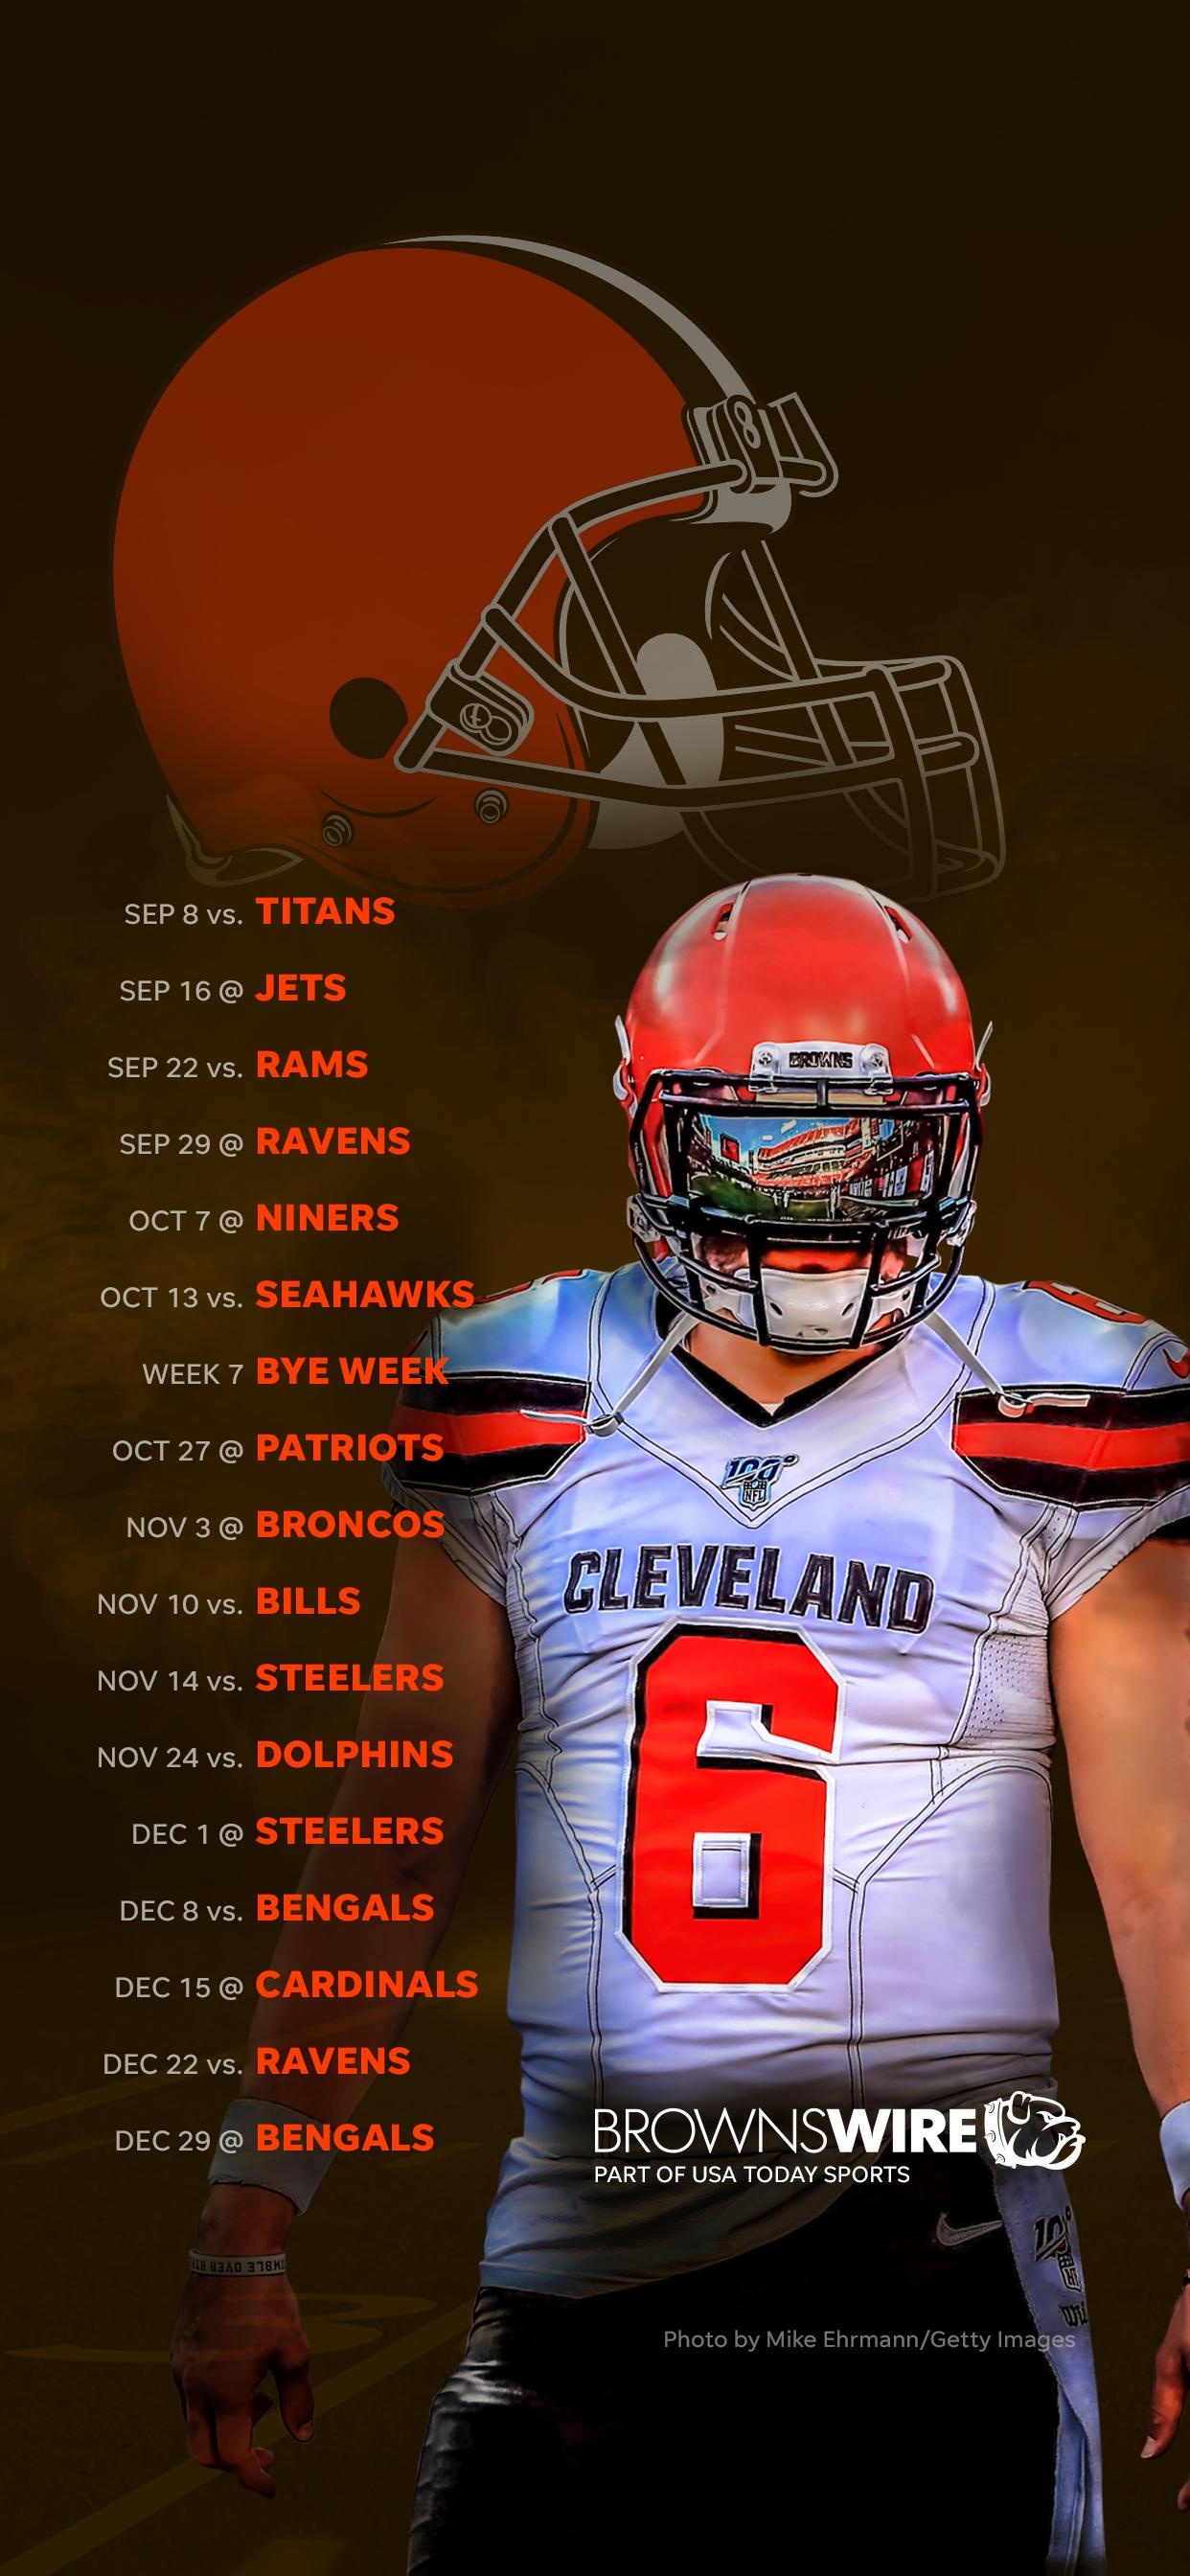 2019 Cleveland Browns schedule Downloadable wallpaper 1242x2688